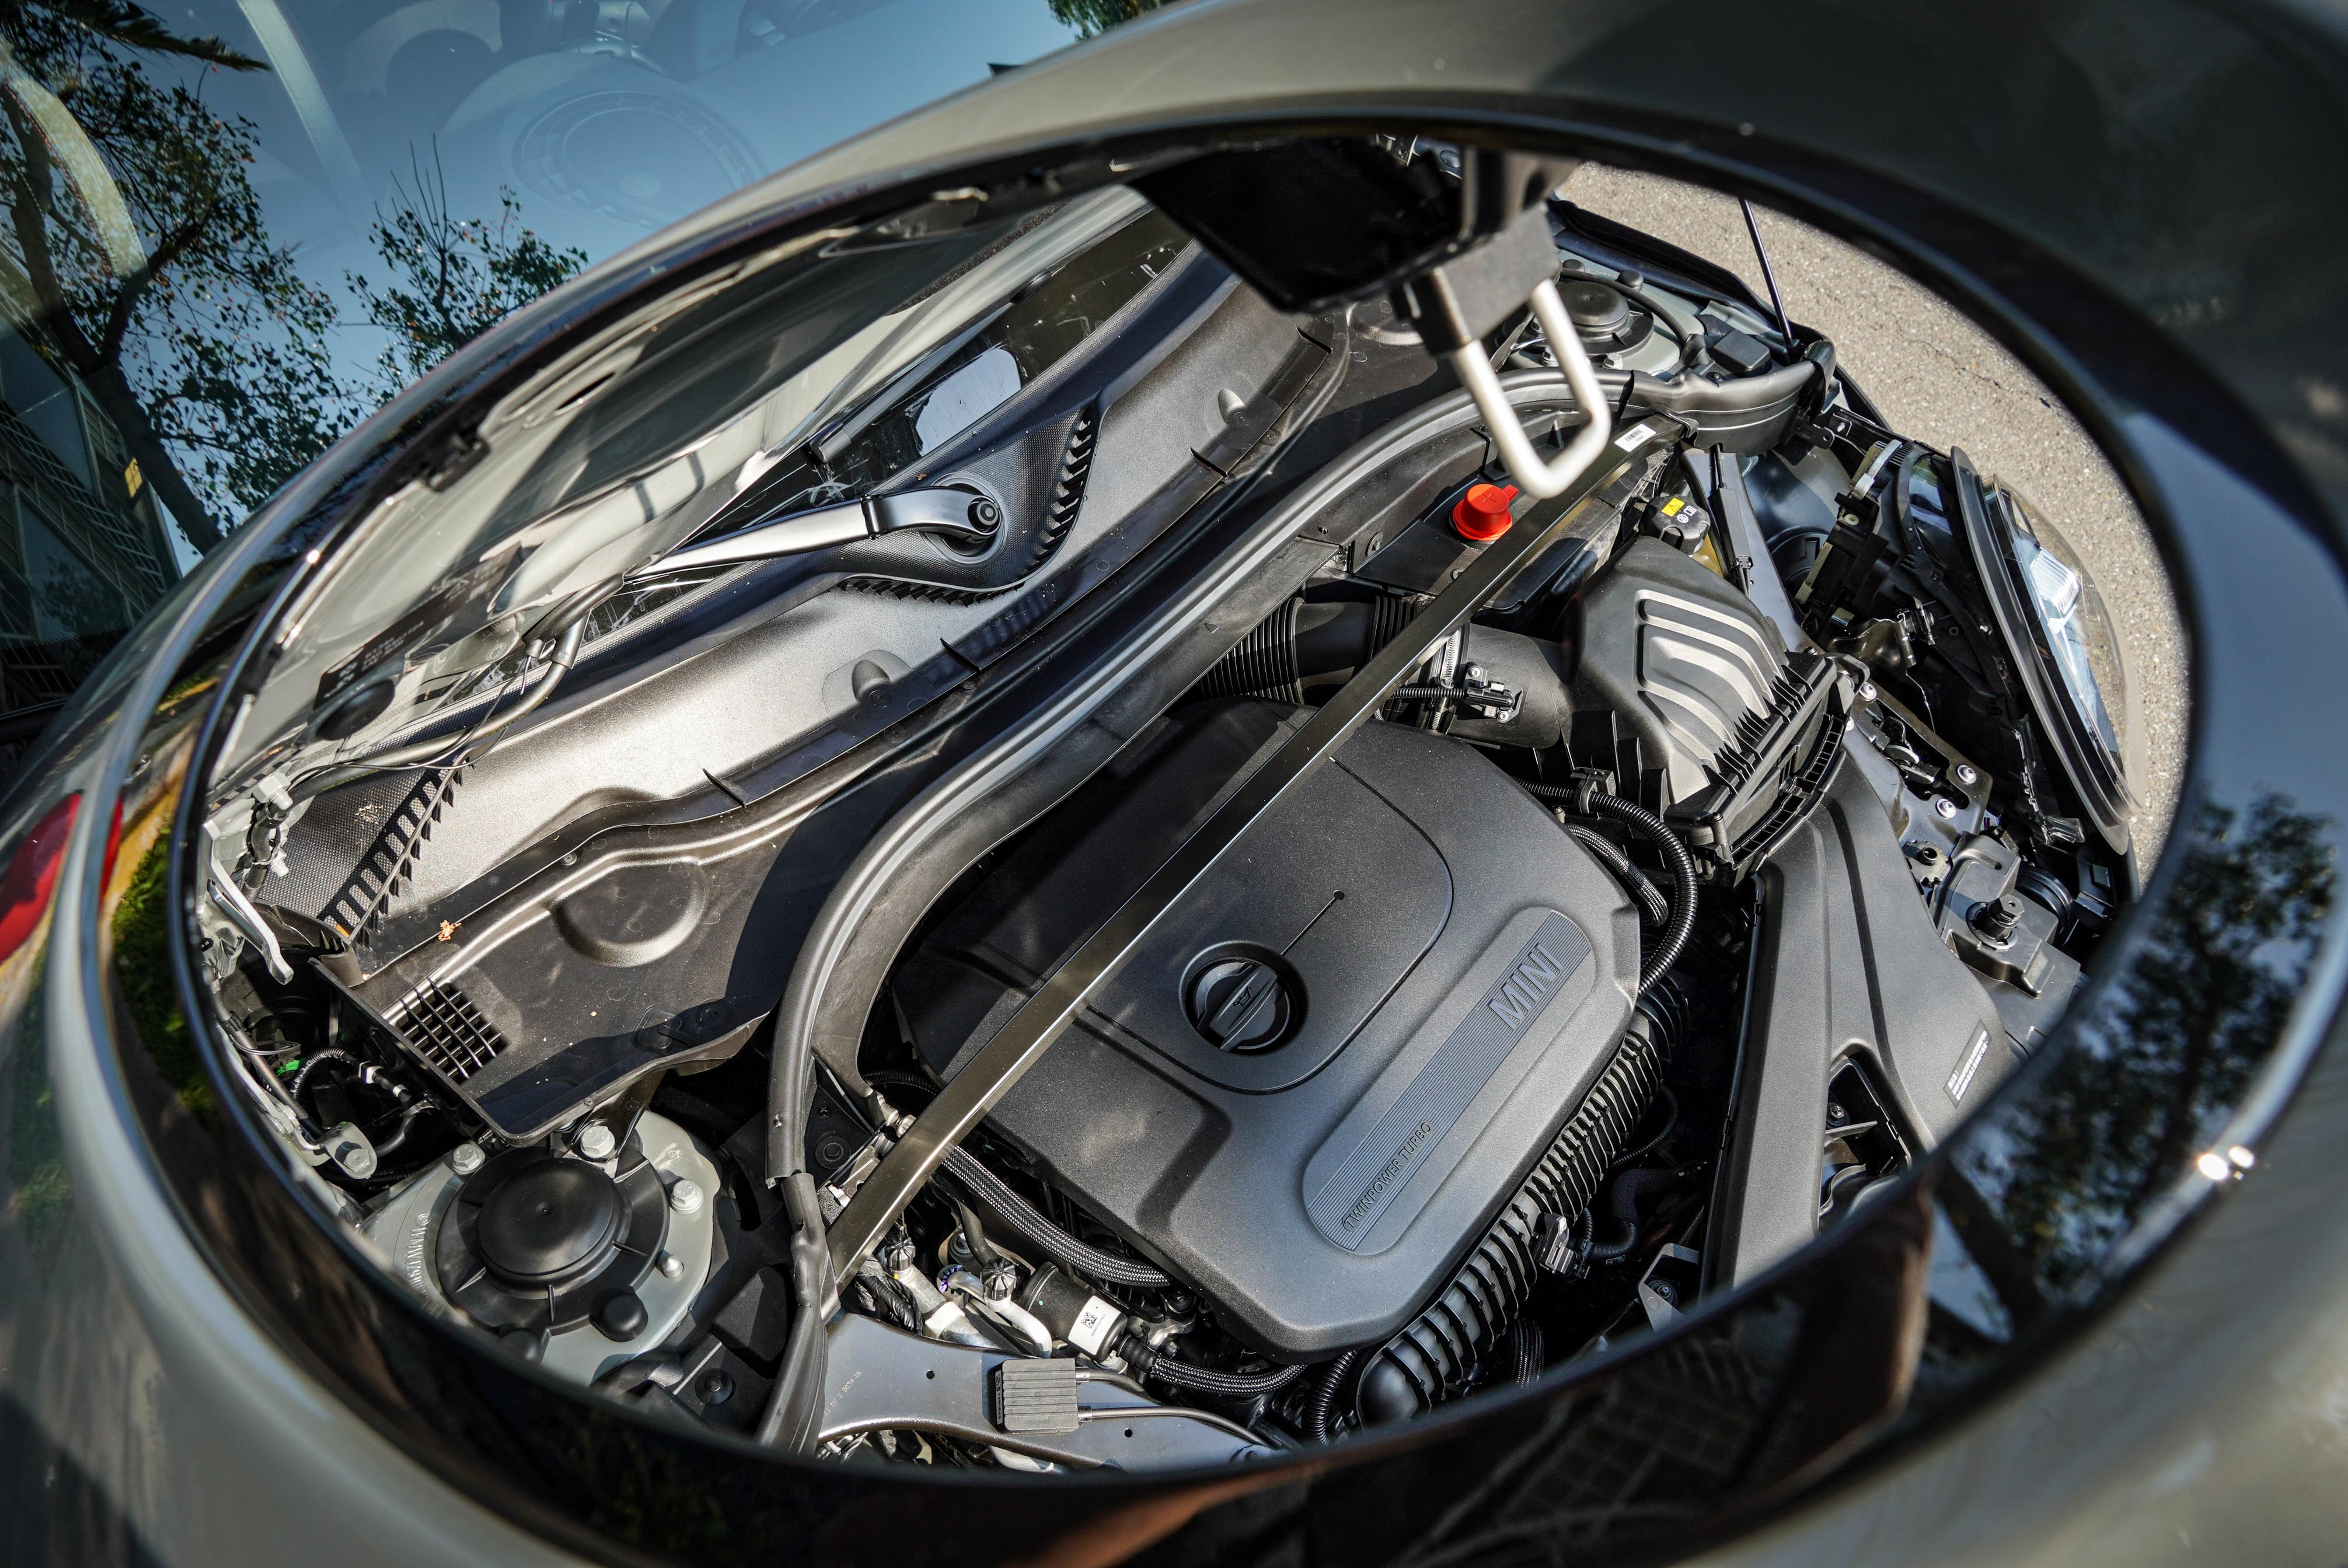 JCW 引擎室多了拉桿強化穩定性。TwinPower Turbo 渦輪四缸引擎出力升級到 306 hp/45.9kgm。